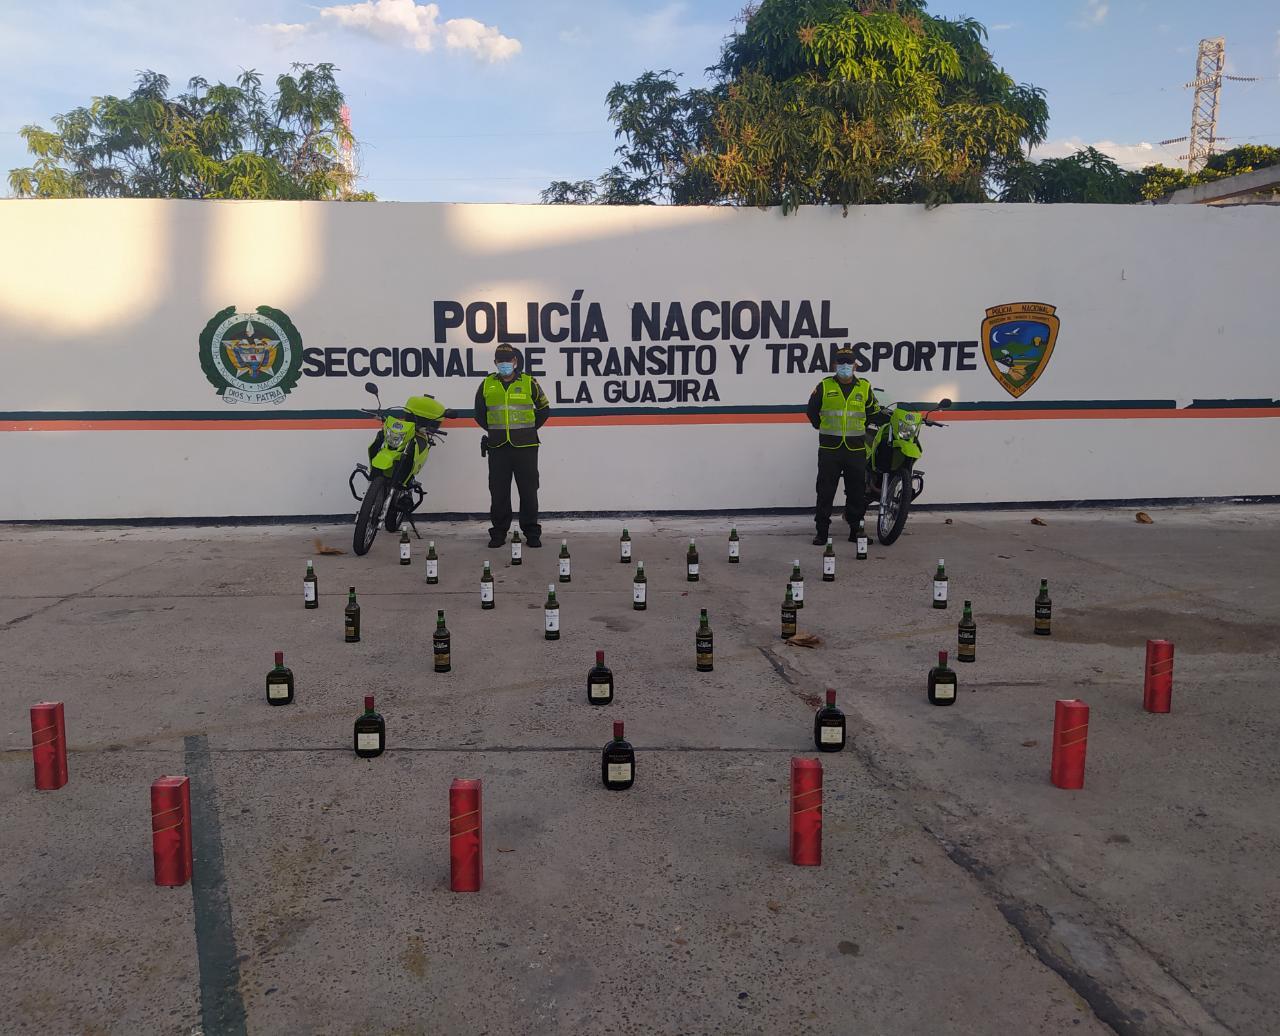 hoyennoticia.com, Mercancias de contrabando por 16 millones se incautan en carreteras guajiras